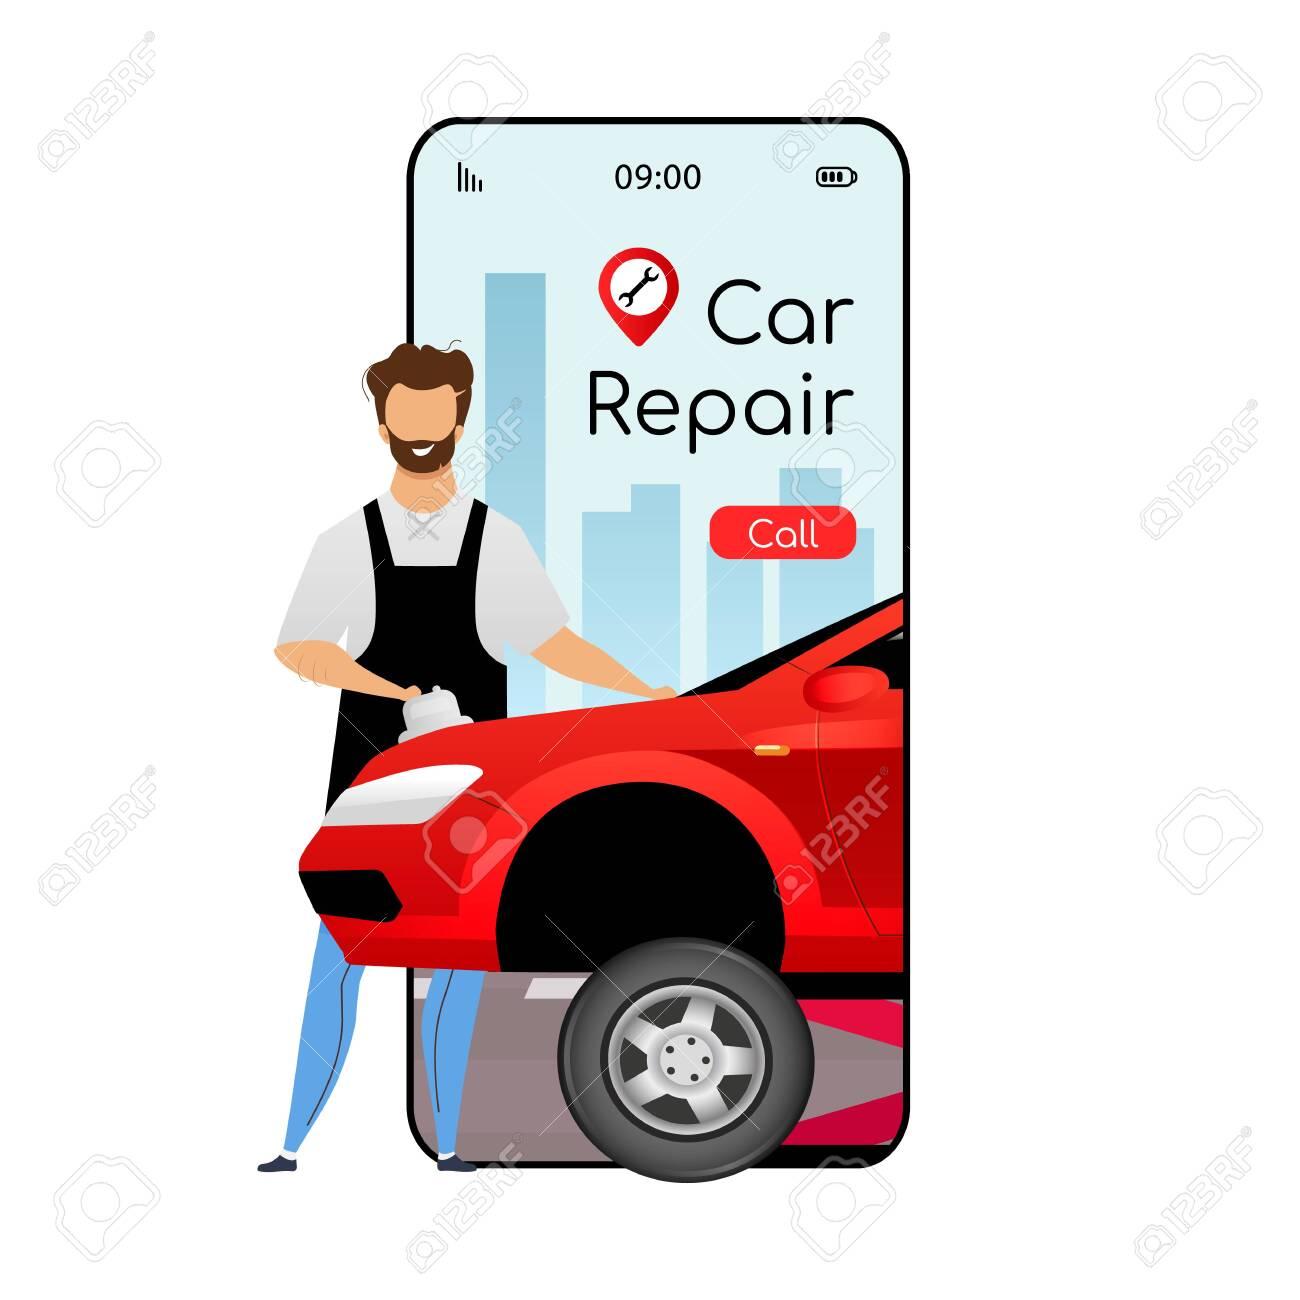 Car Repair Cartoon Smartphone Vector App Screen Mobile Phone Royalty Free Cliparts Vectors And Stock Illustration Image 140891481